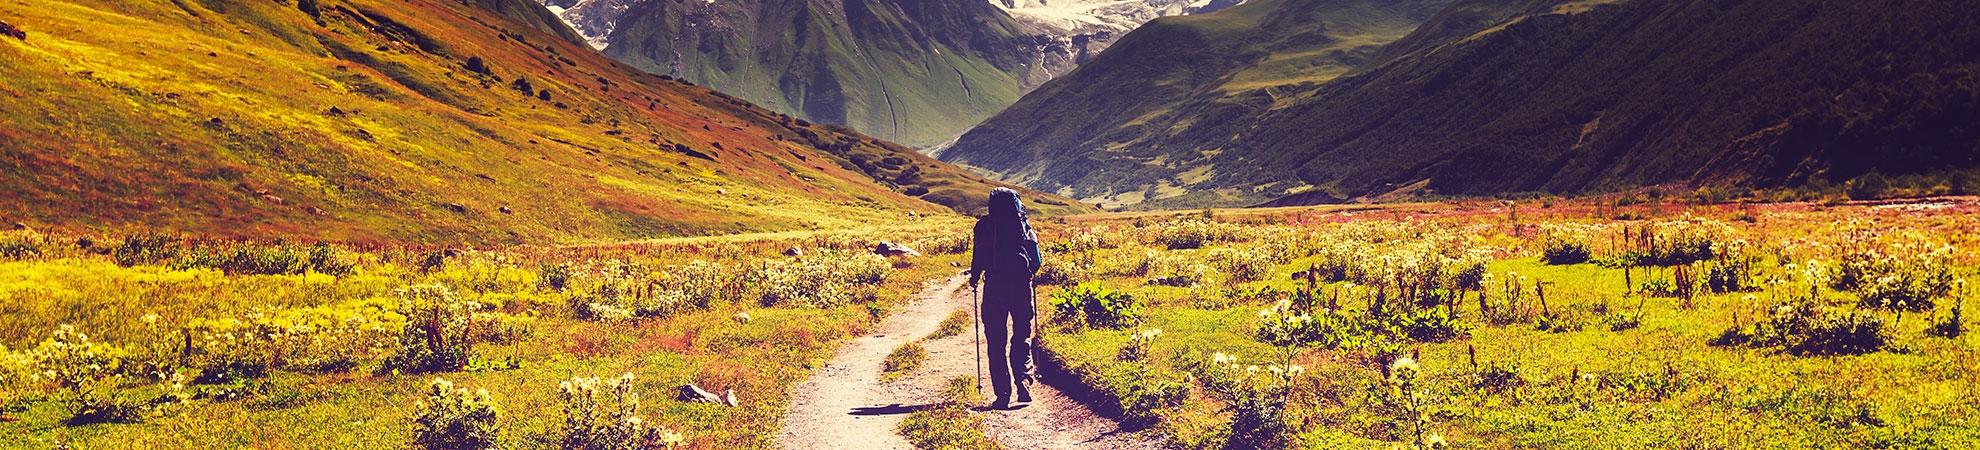 Toutes nos activités Trekking